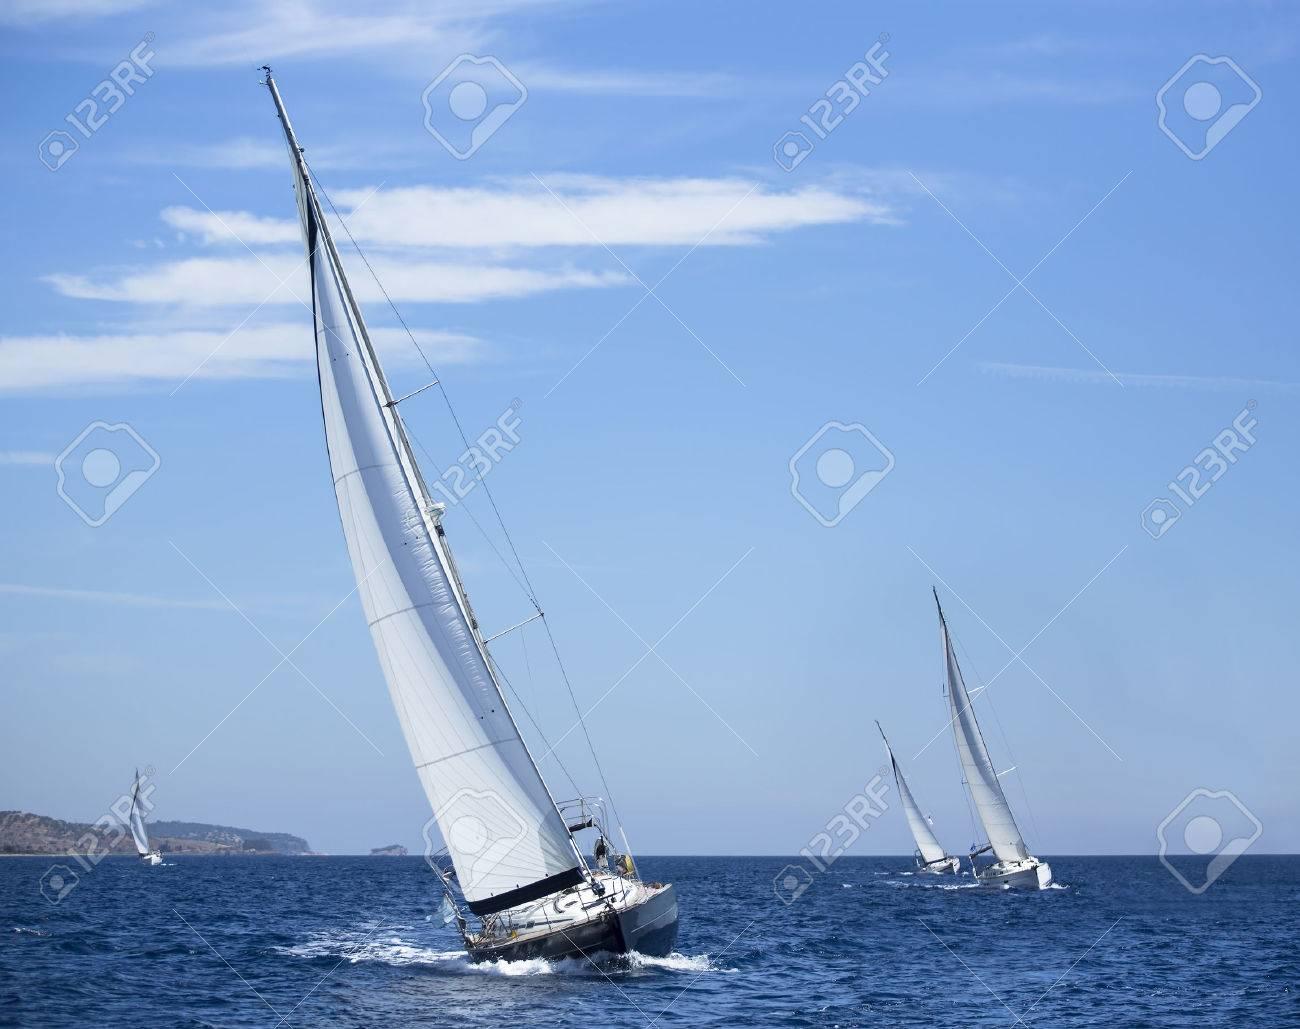 Boats in sailing regatta. Yachting. Luxury yachts. - 39381792